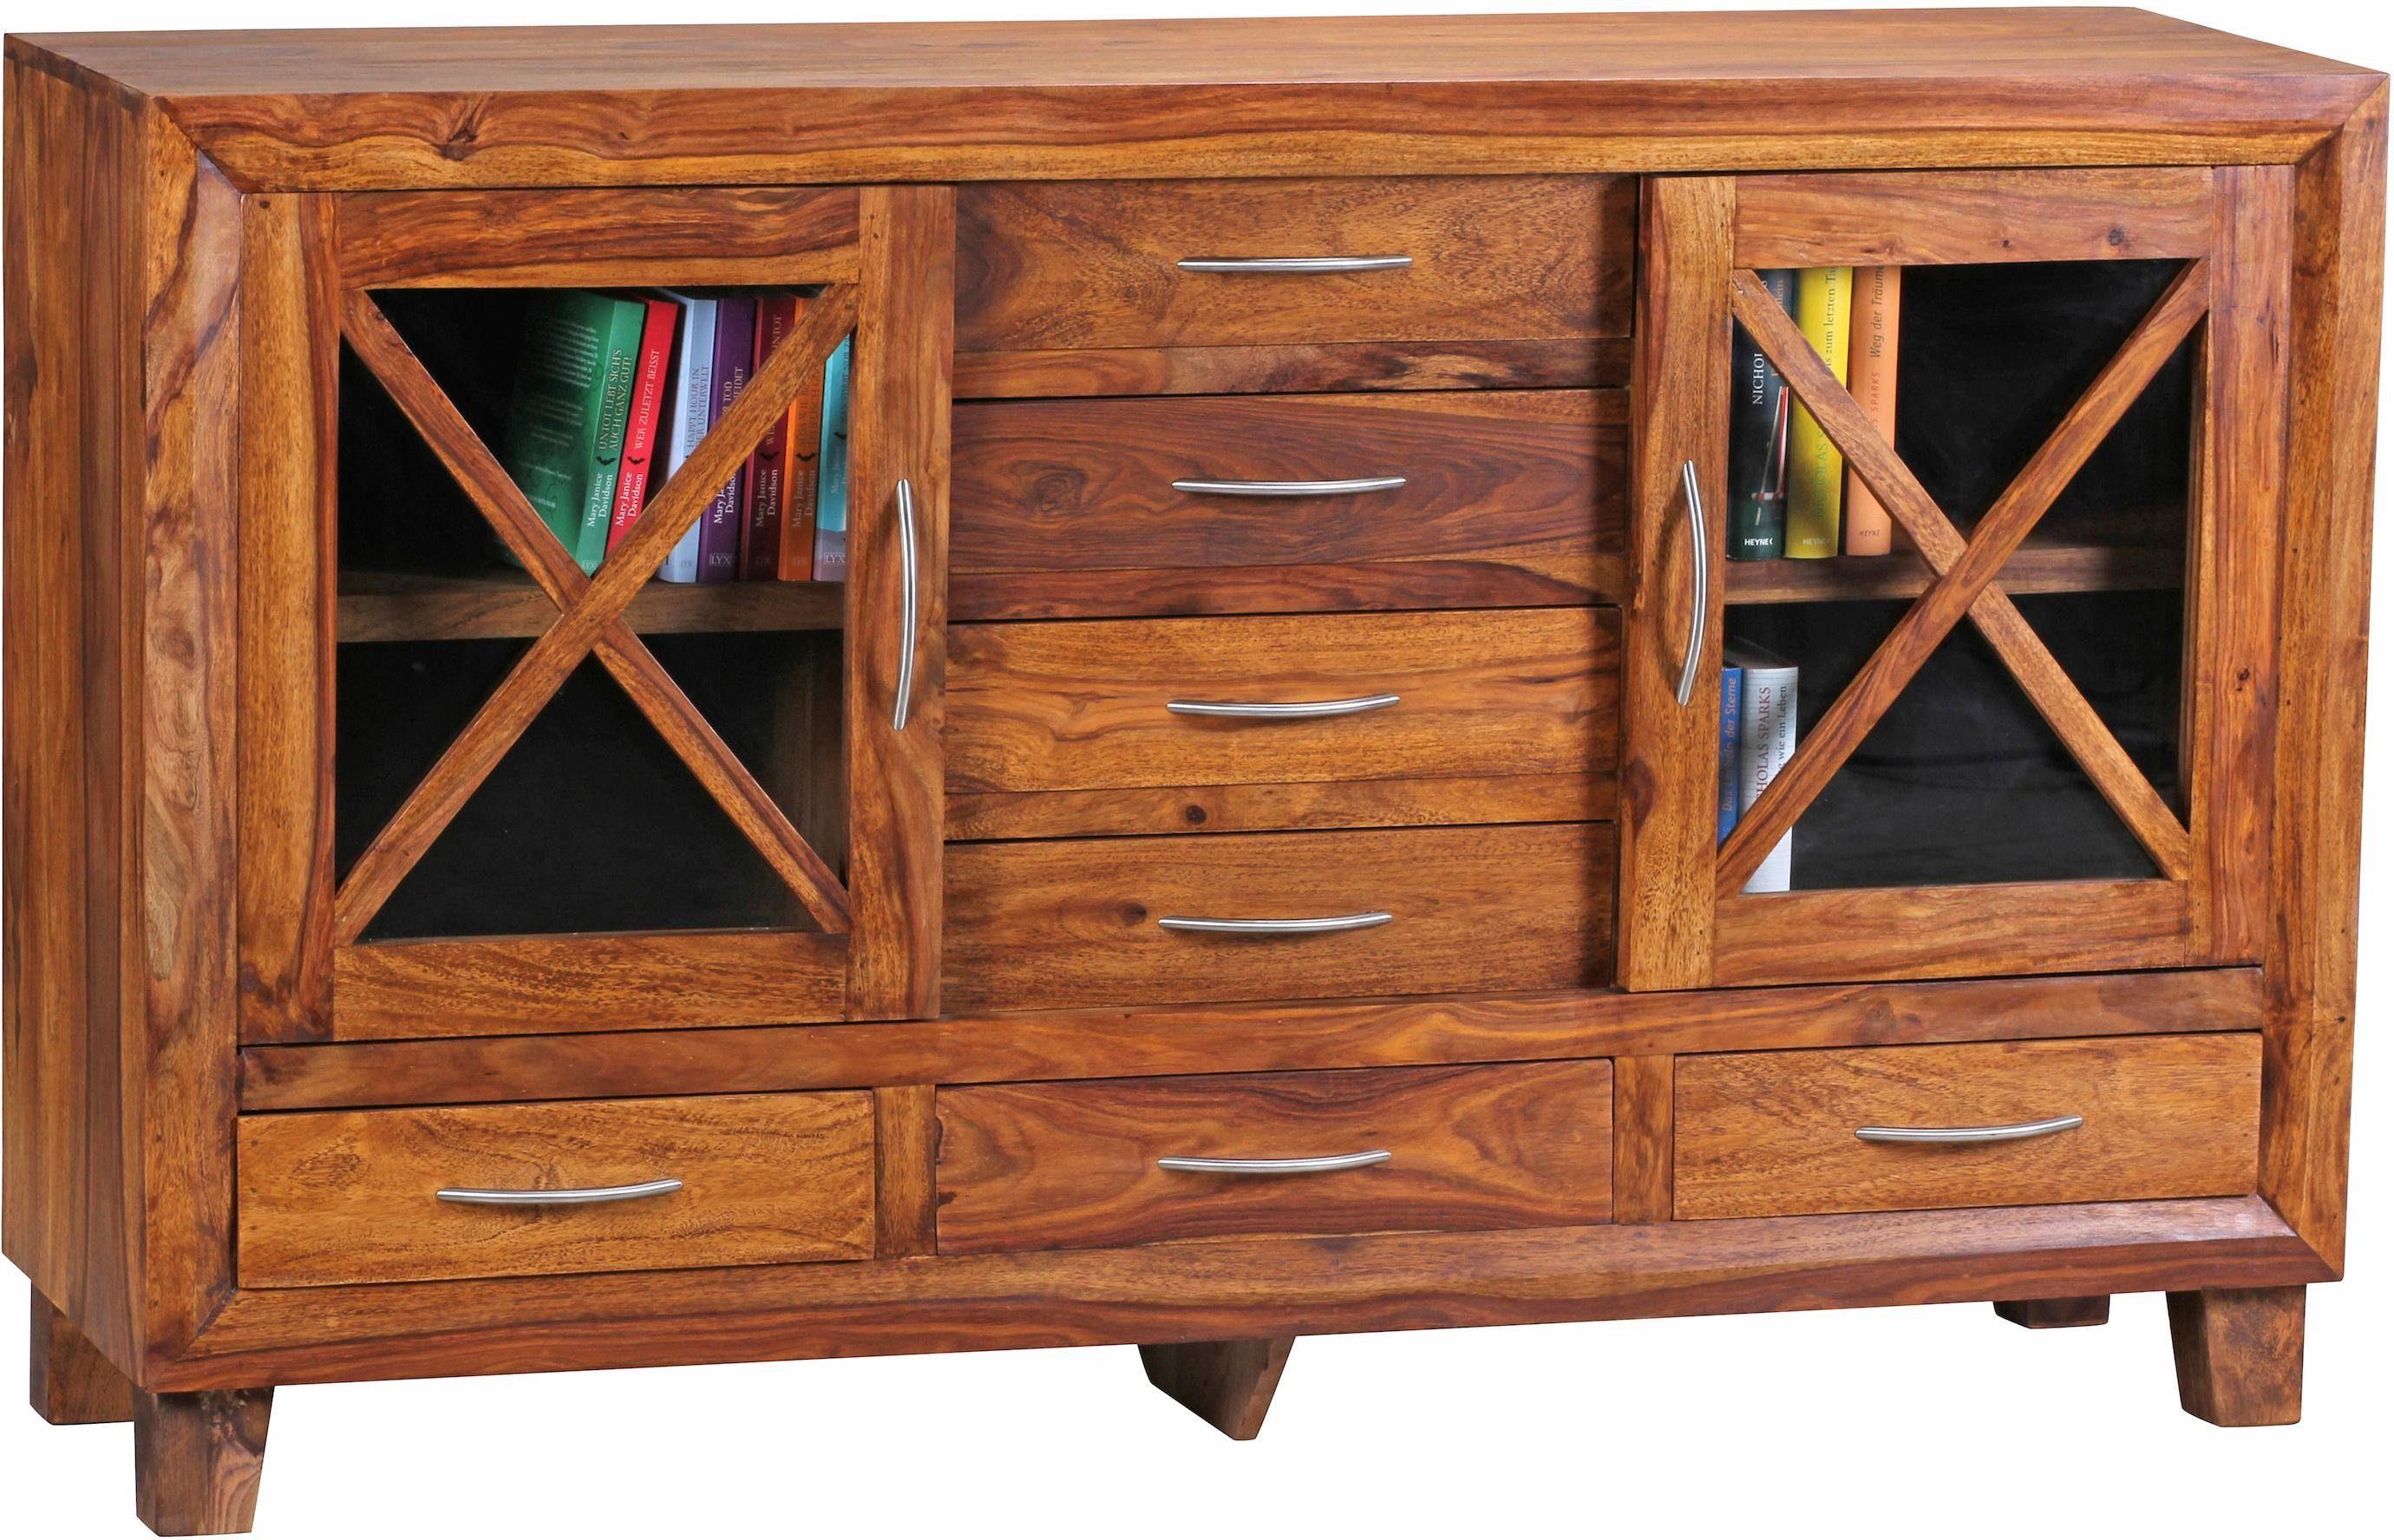 Home affaire Sideboard »Malati« 150 cm breit